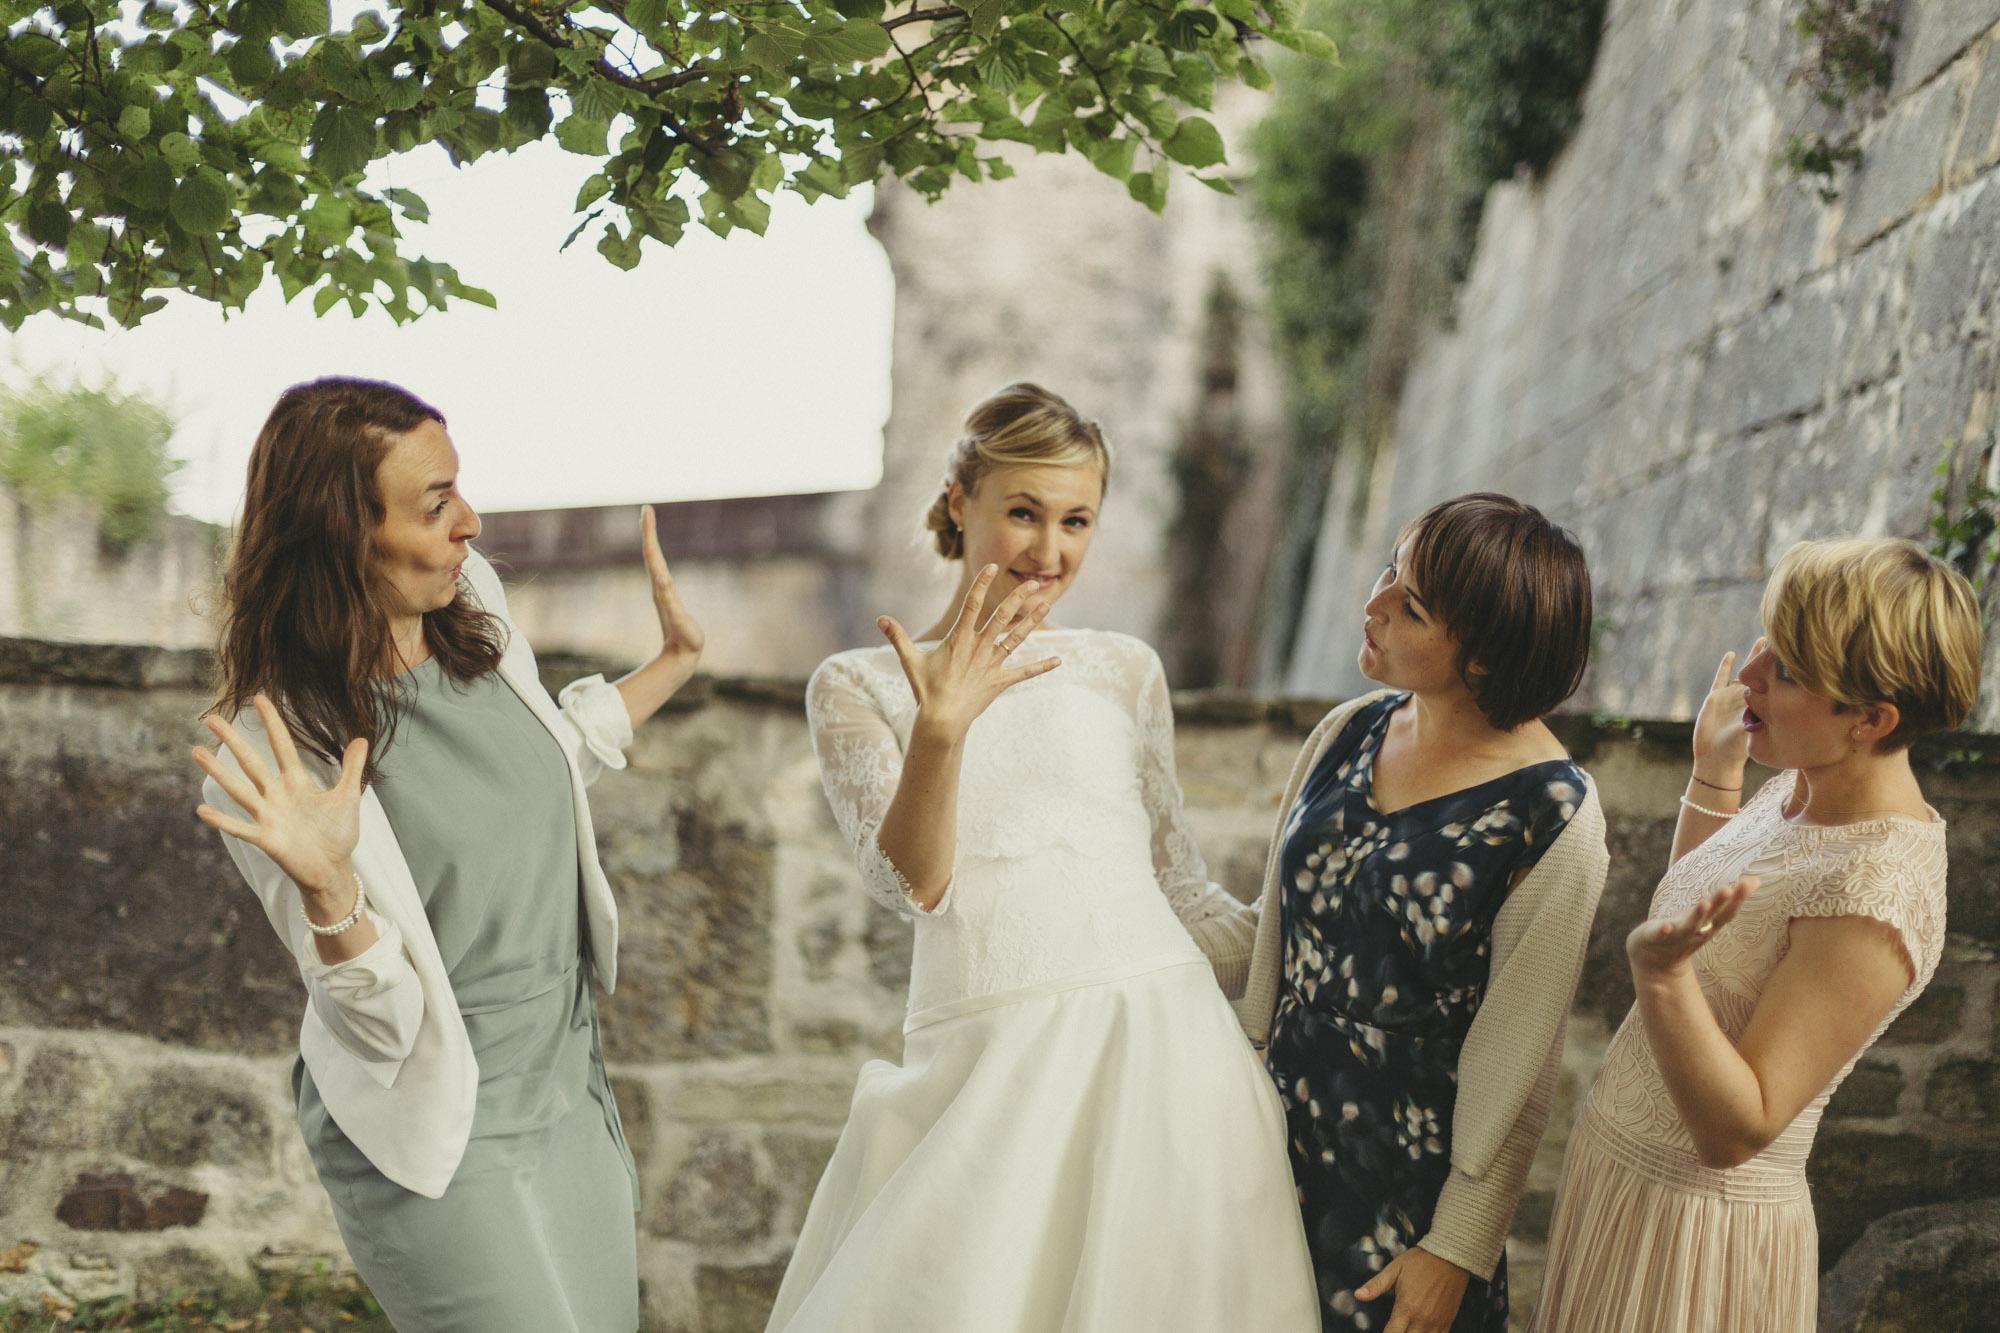 Hochzeitsfotografie-Tuebingen-Doro-Stefan-39